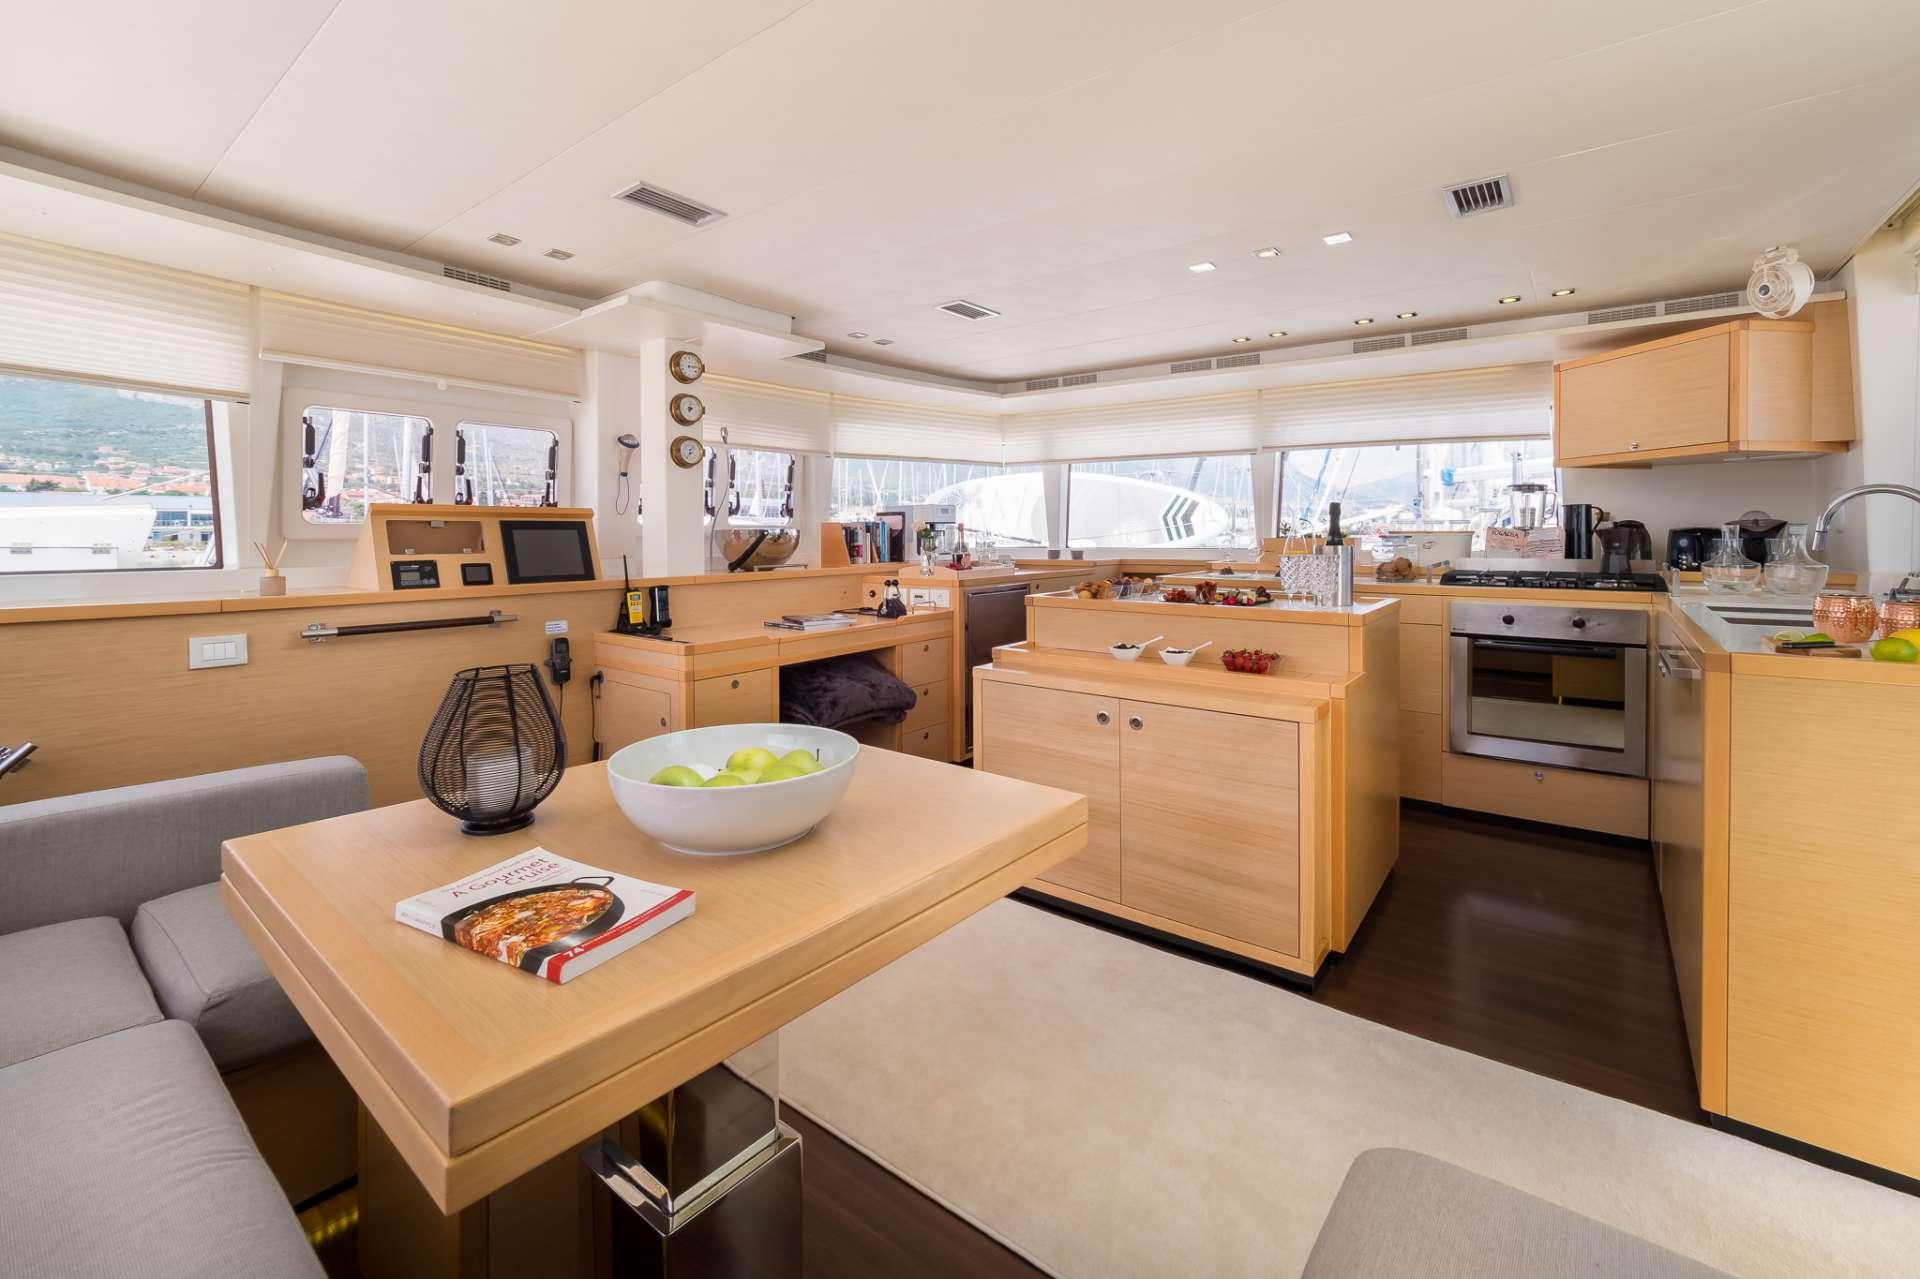 Cat Yacht 'Cat', 8 PAX, 2 Crew, 56.00 Ft, 17.00 Meters, Built 2012, Lagoon, Refit Year 2018